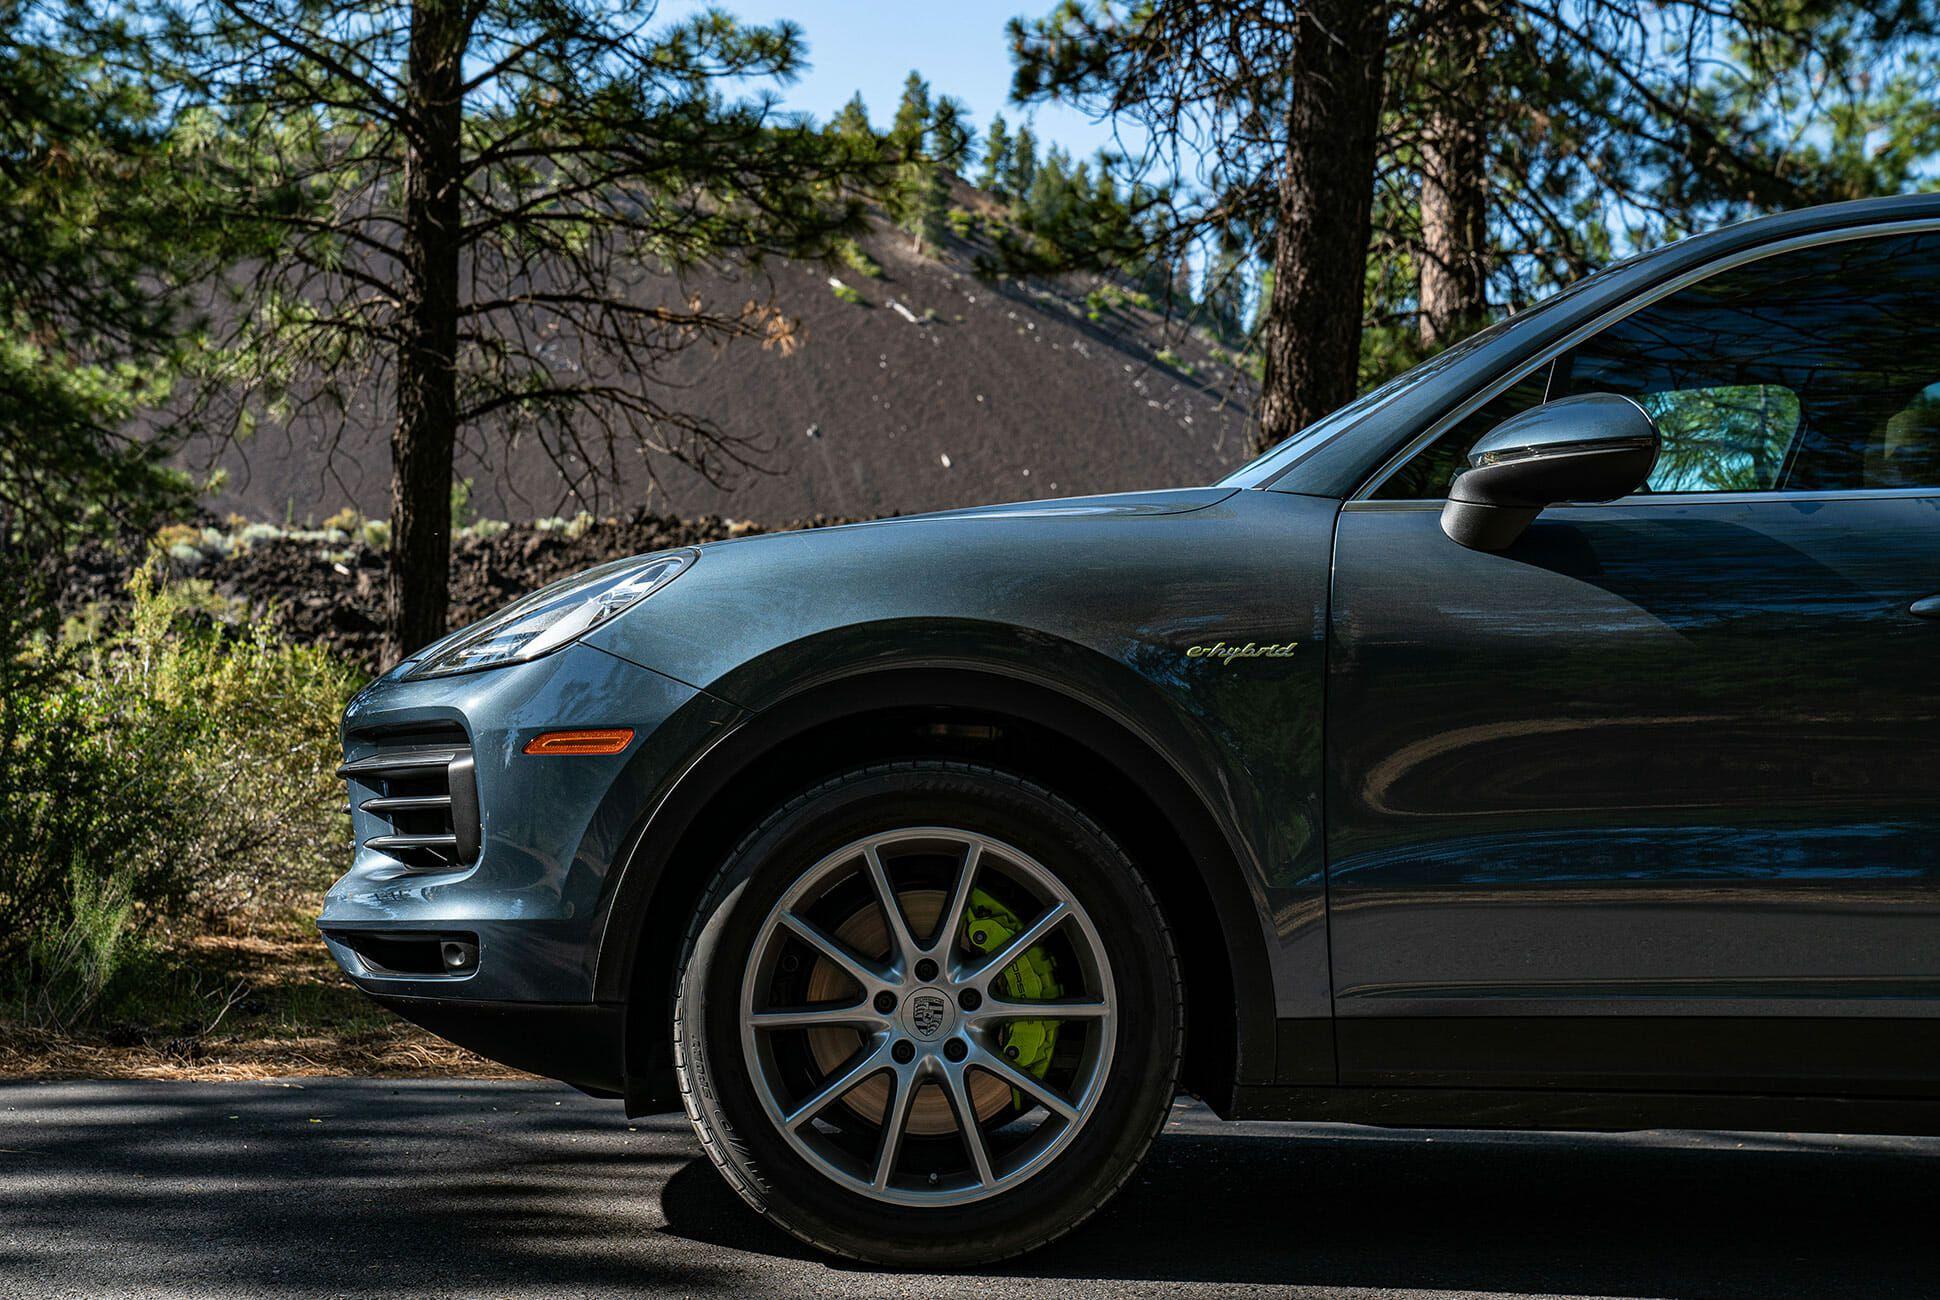 Pair-of-High-Tech-Porsche-Cayenne-Hybrids-gear-patrol-Lava-ambience-1